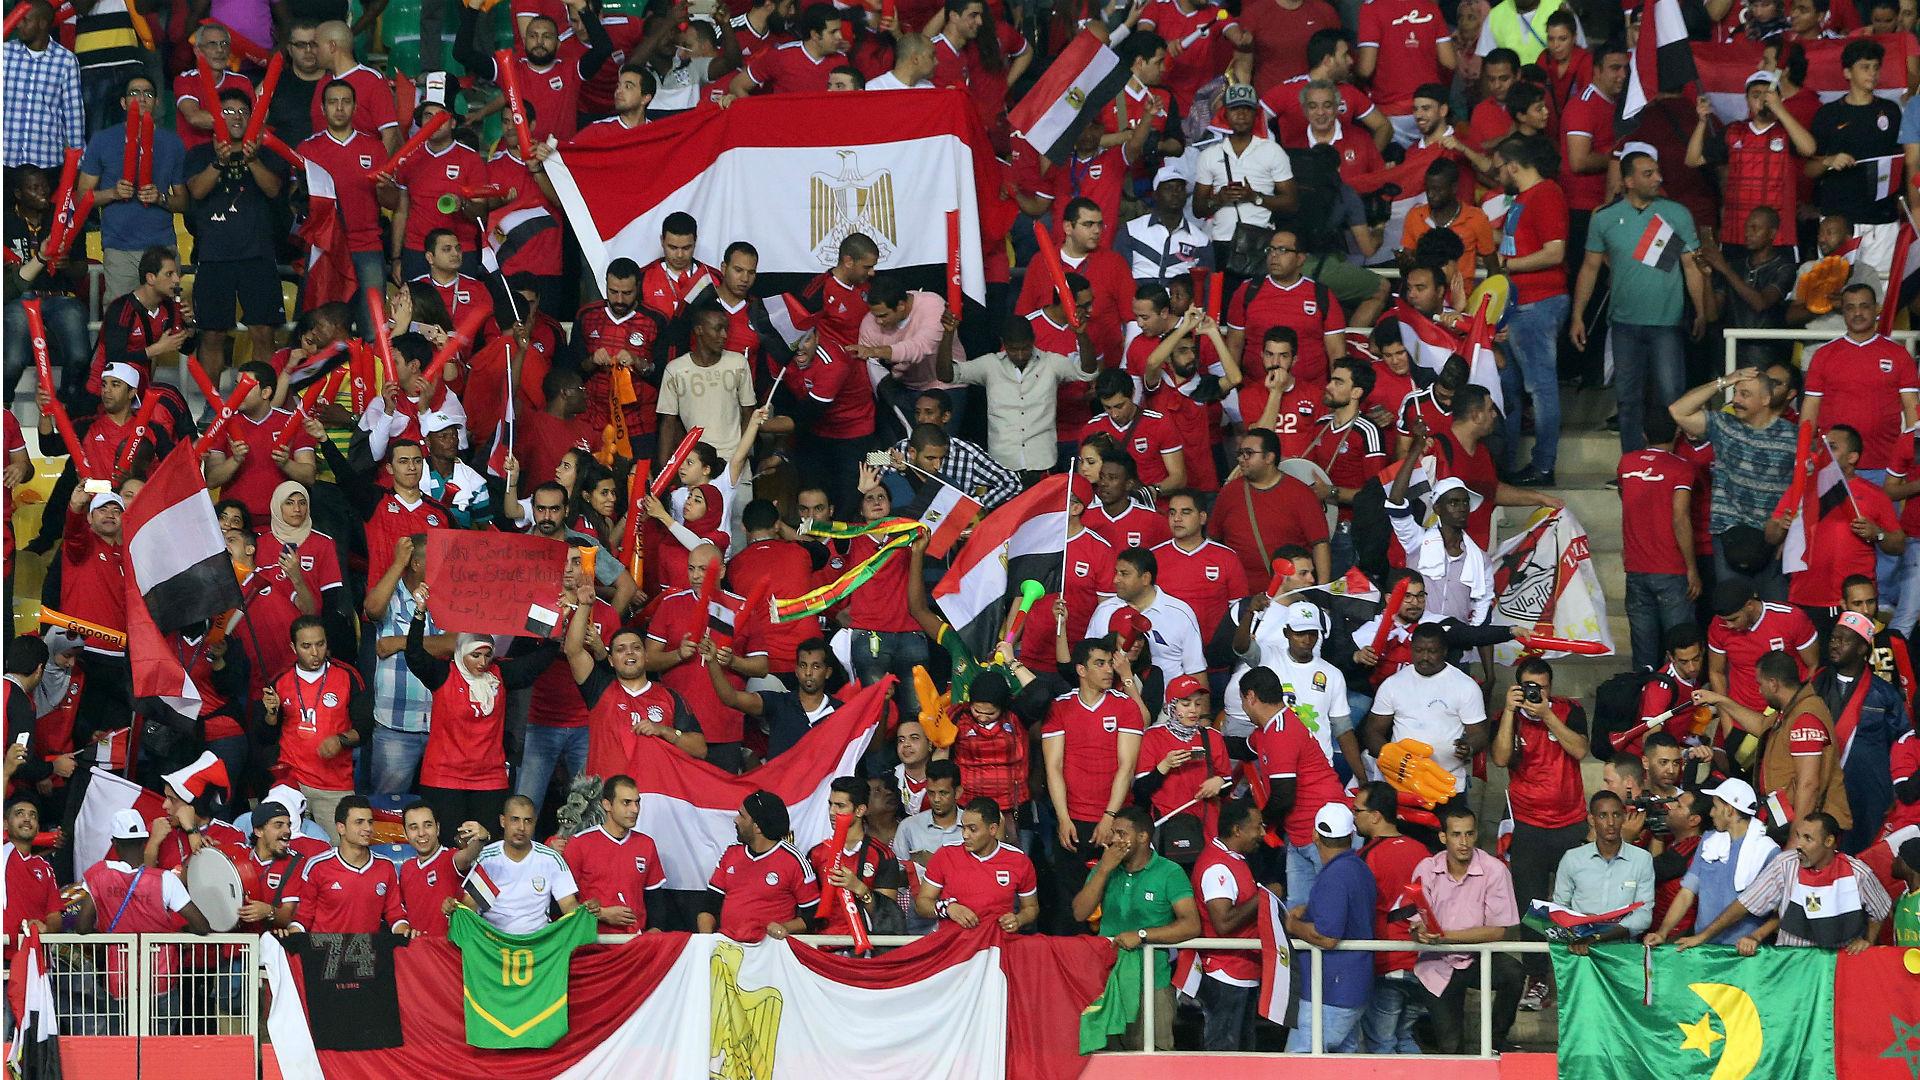 U23 Afcon: Ghana coach Tanko wary of Egyptian crowd